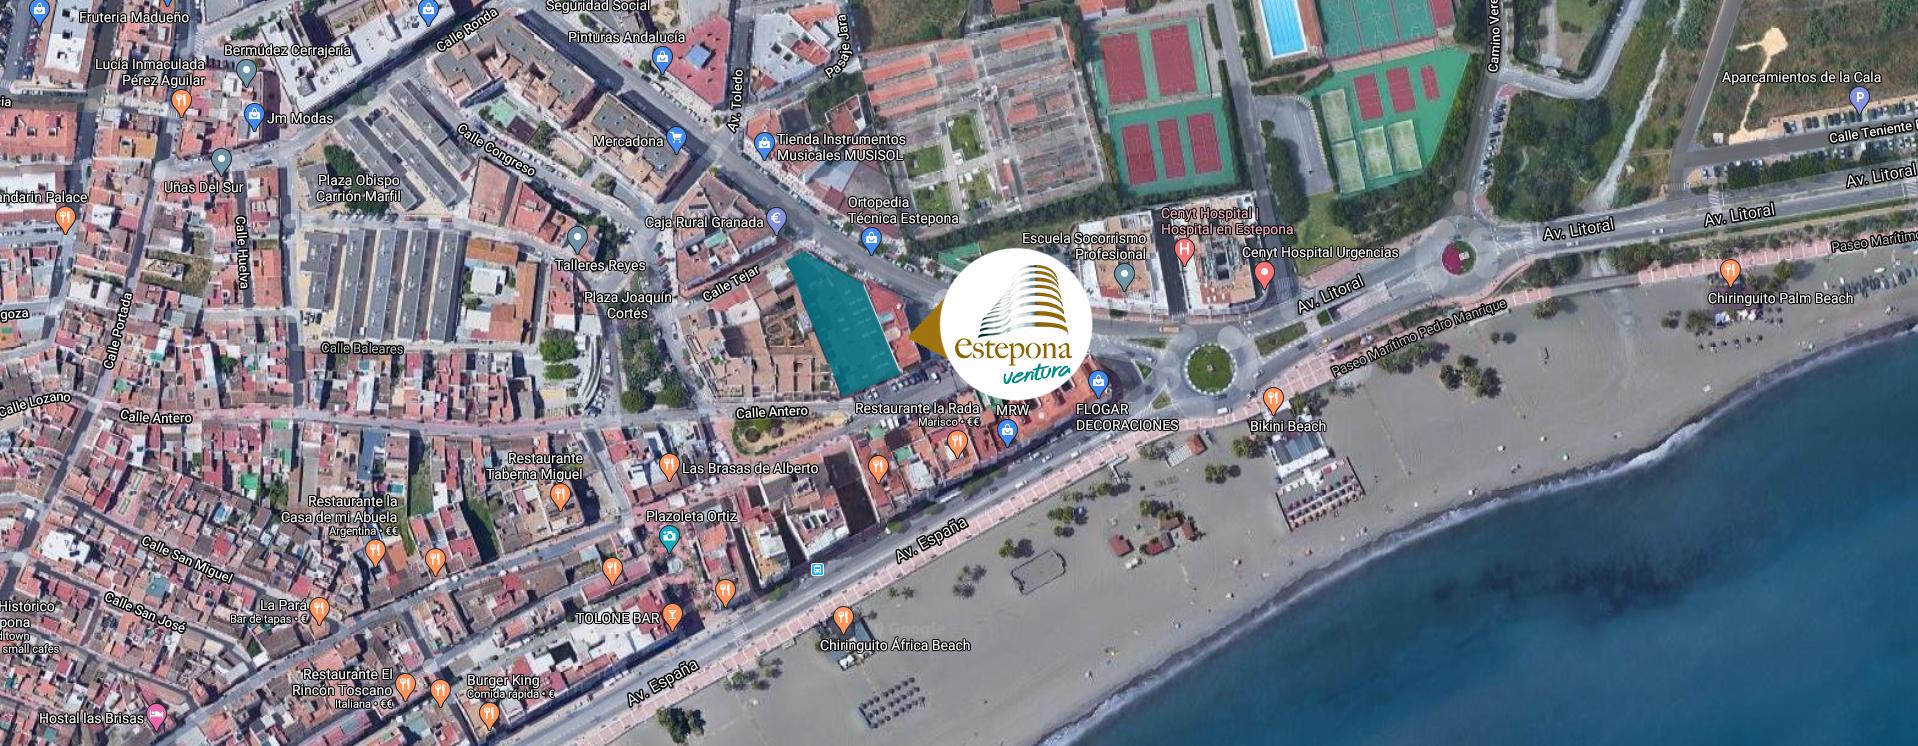 mapa - Ventura Estepona | Compra de casa en Estepona